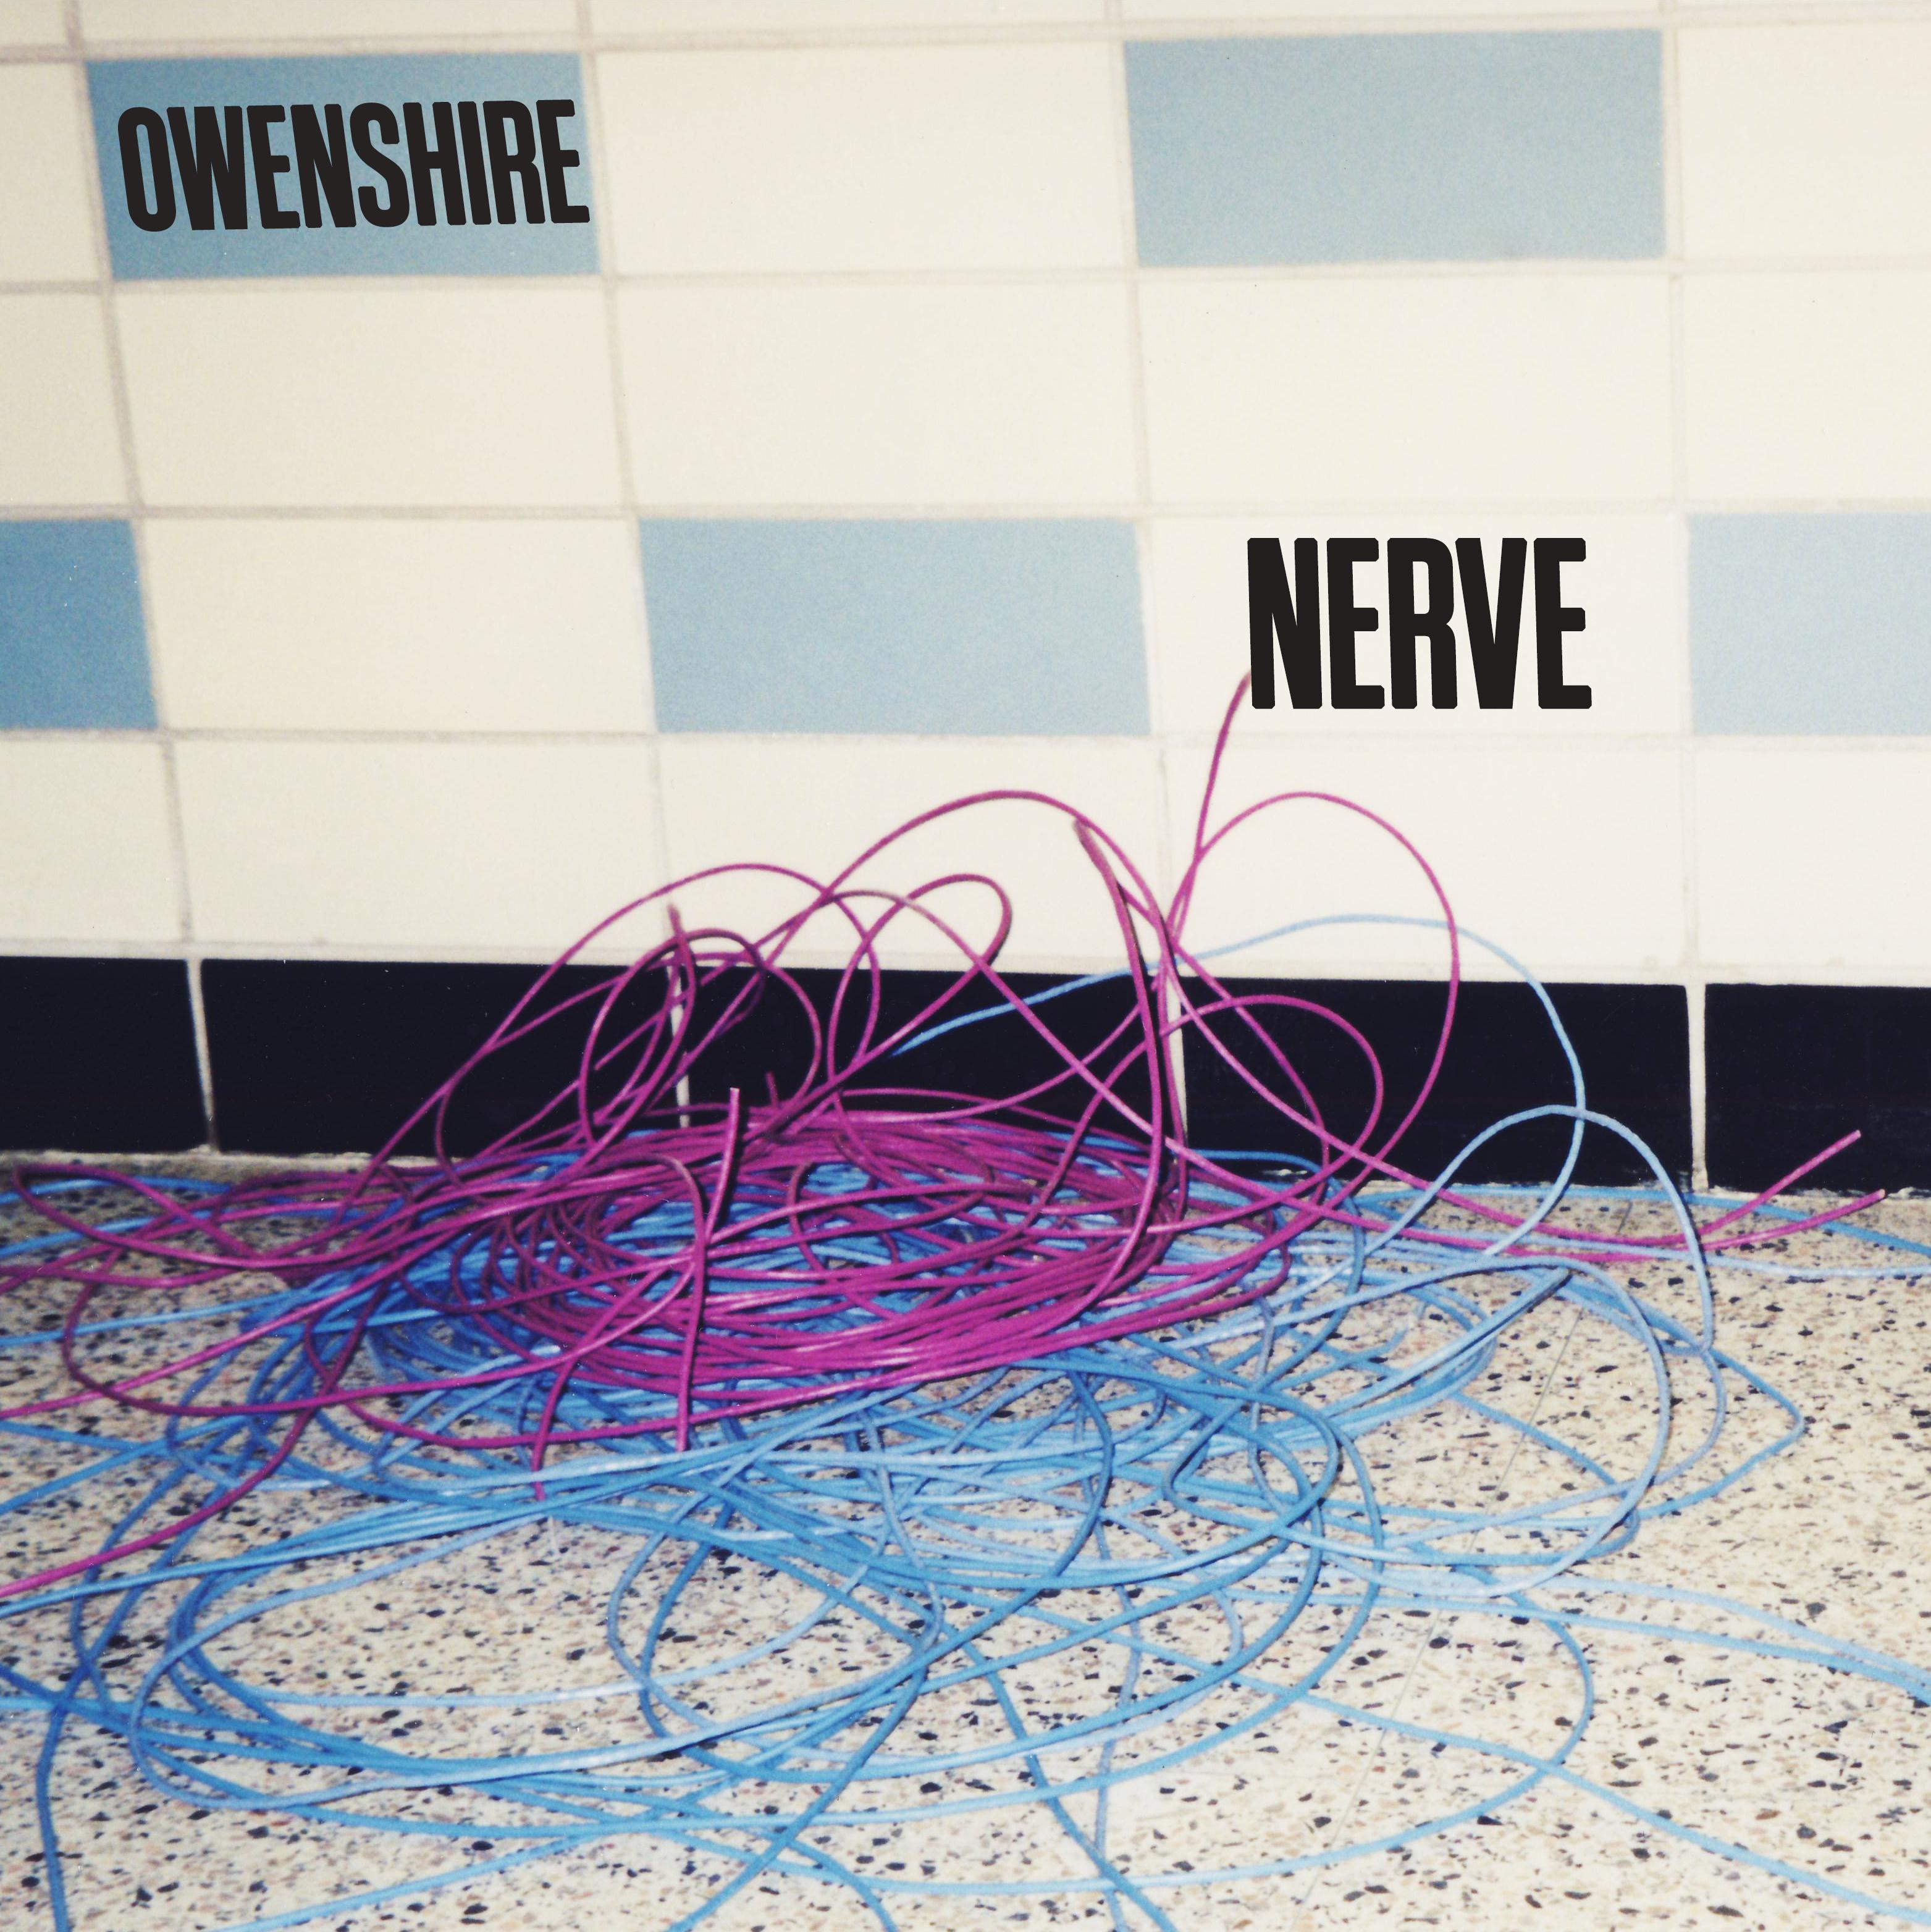 Owenshire Nerve Album Cover Robert Muhlbock